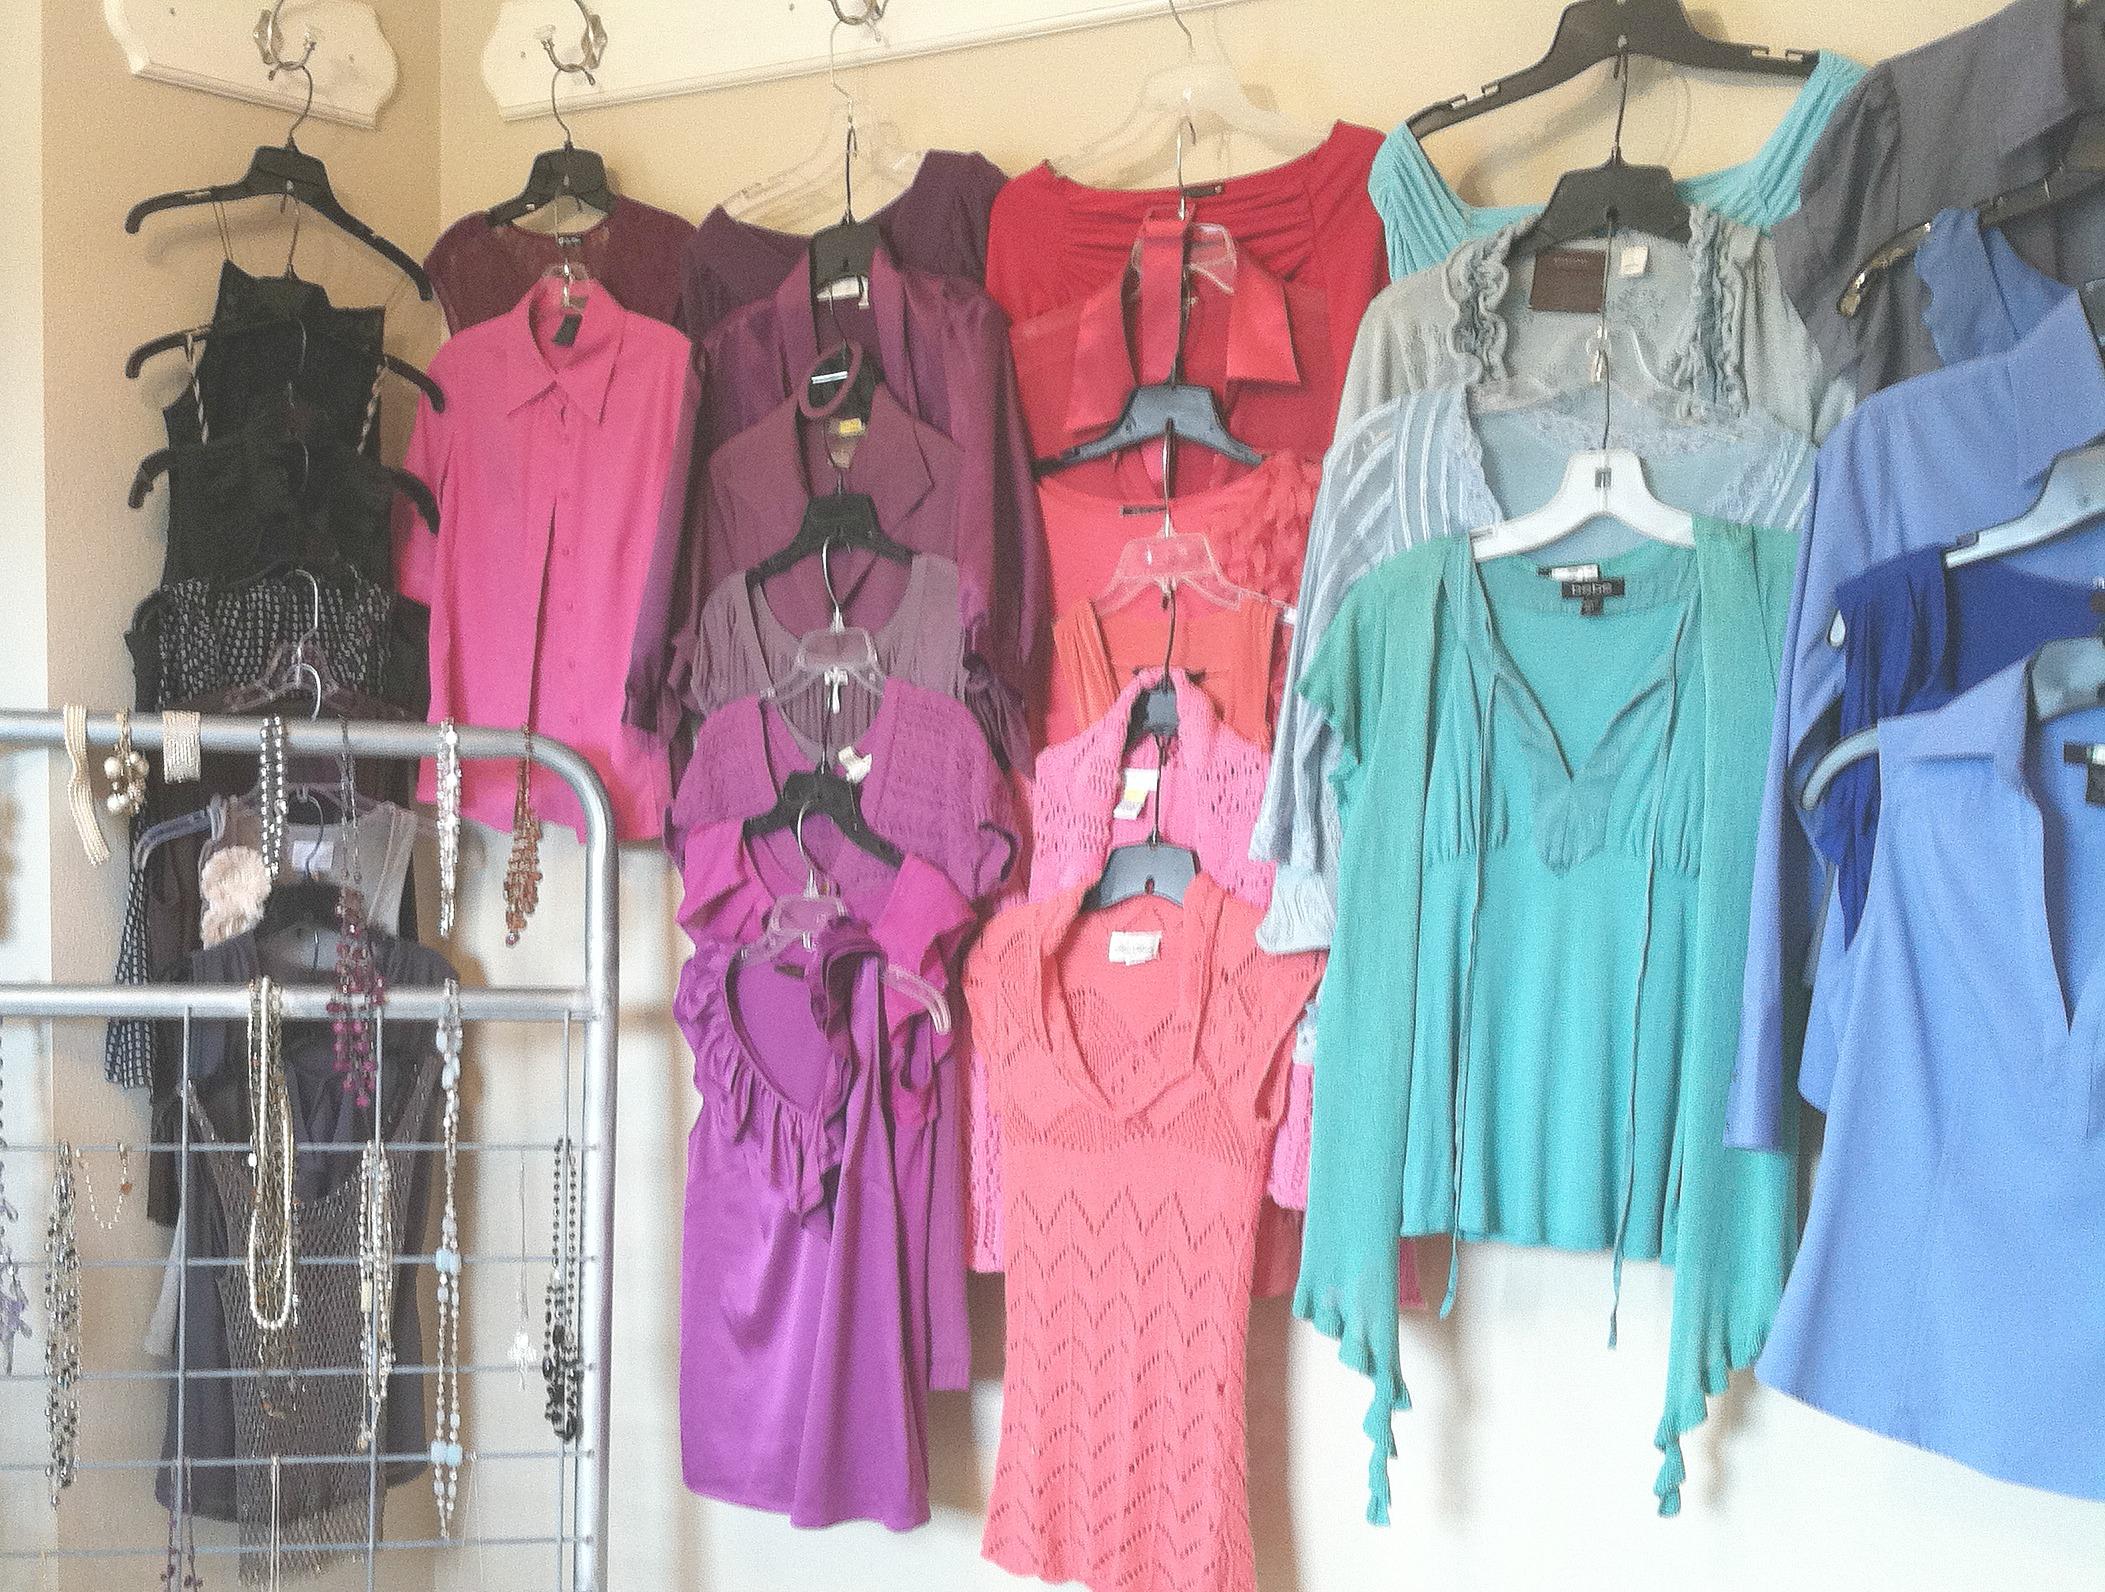 Organize Your Closet - An Unconventional Idea